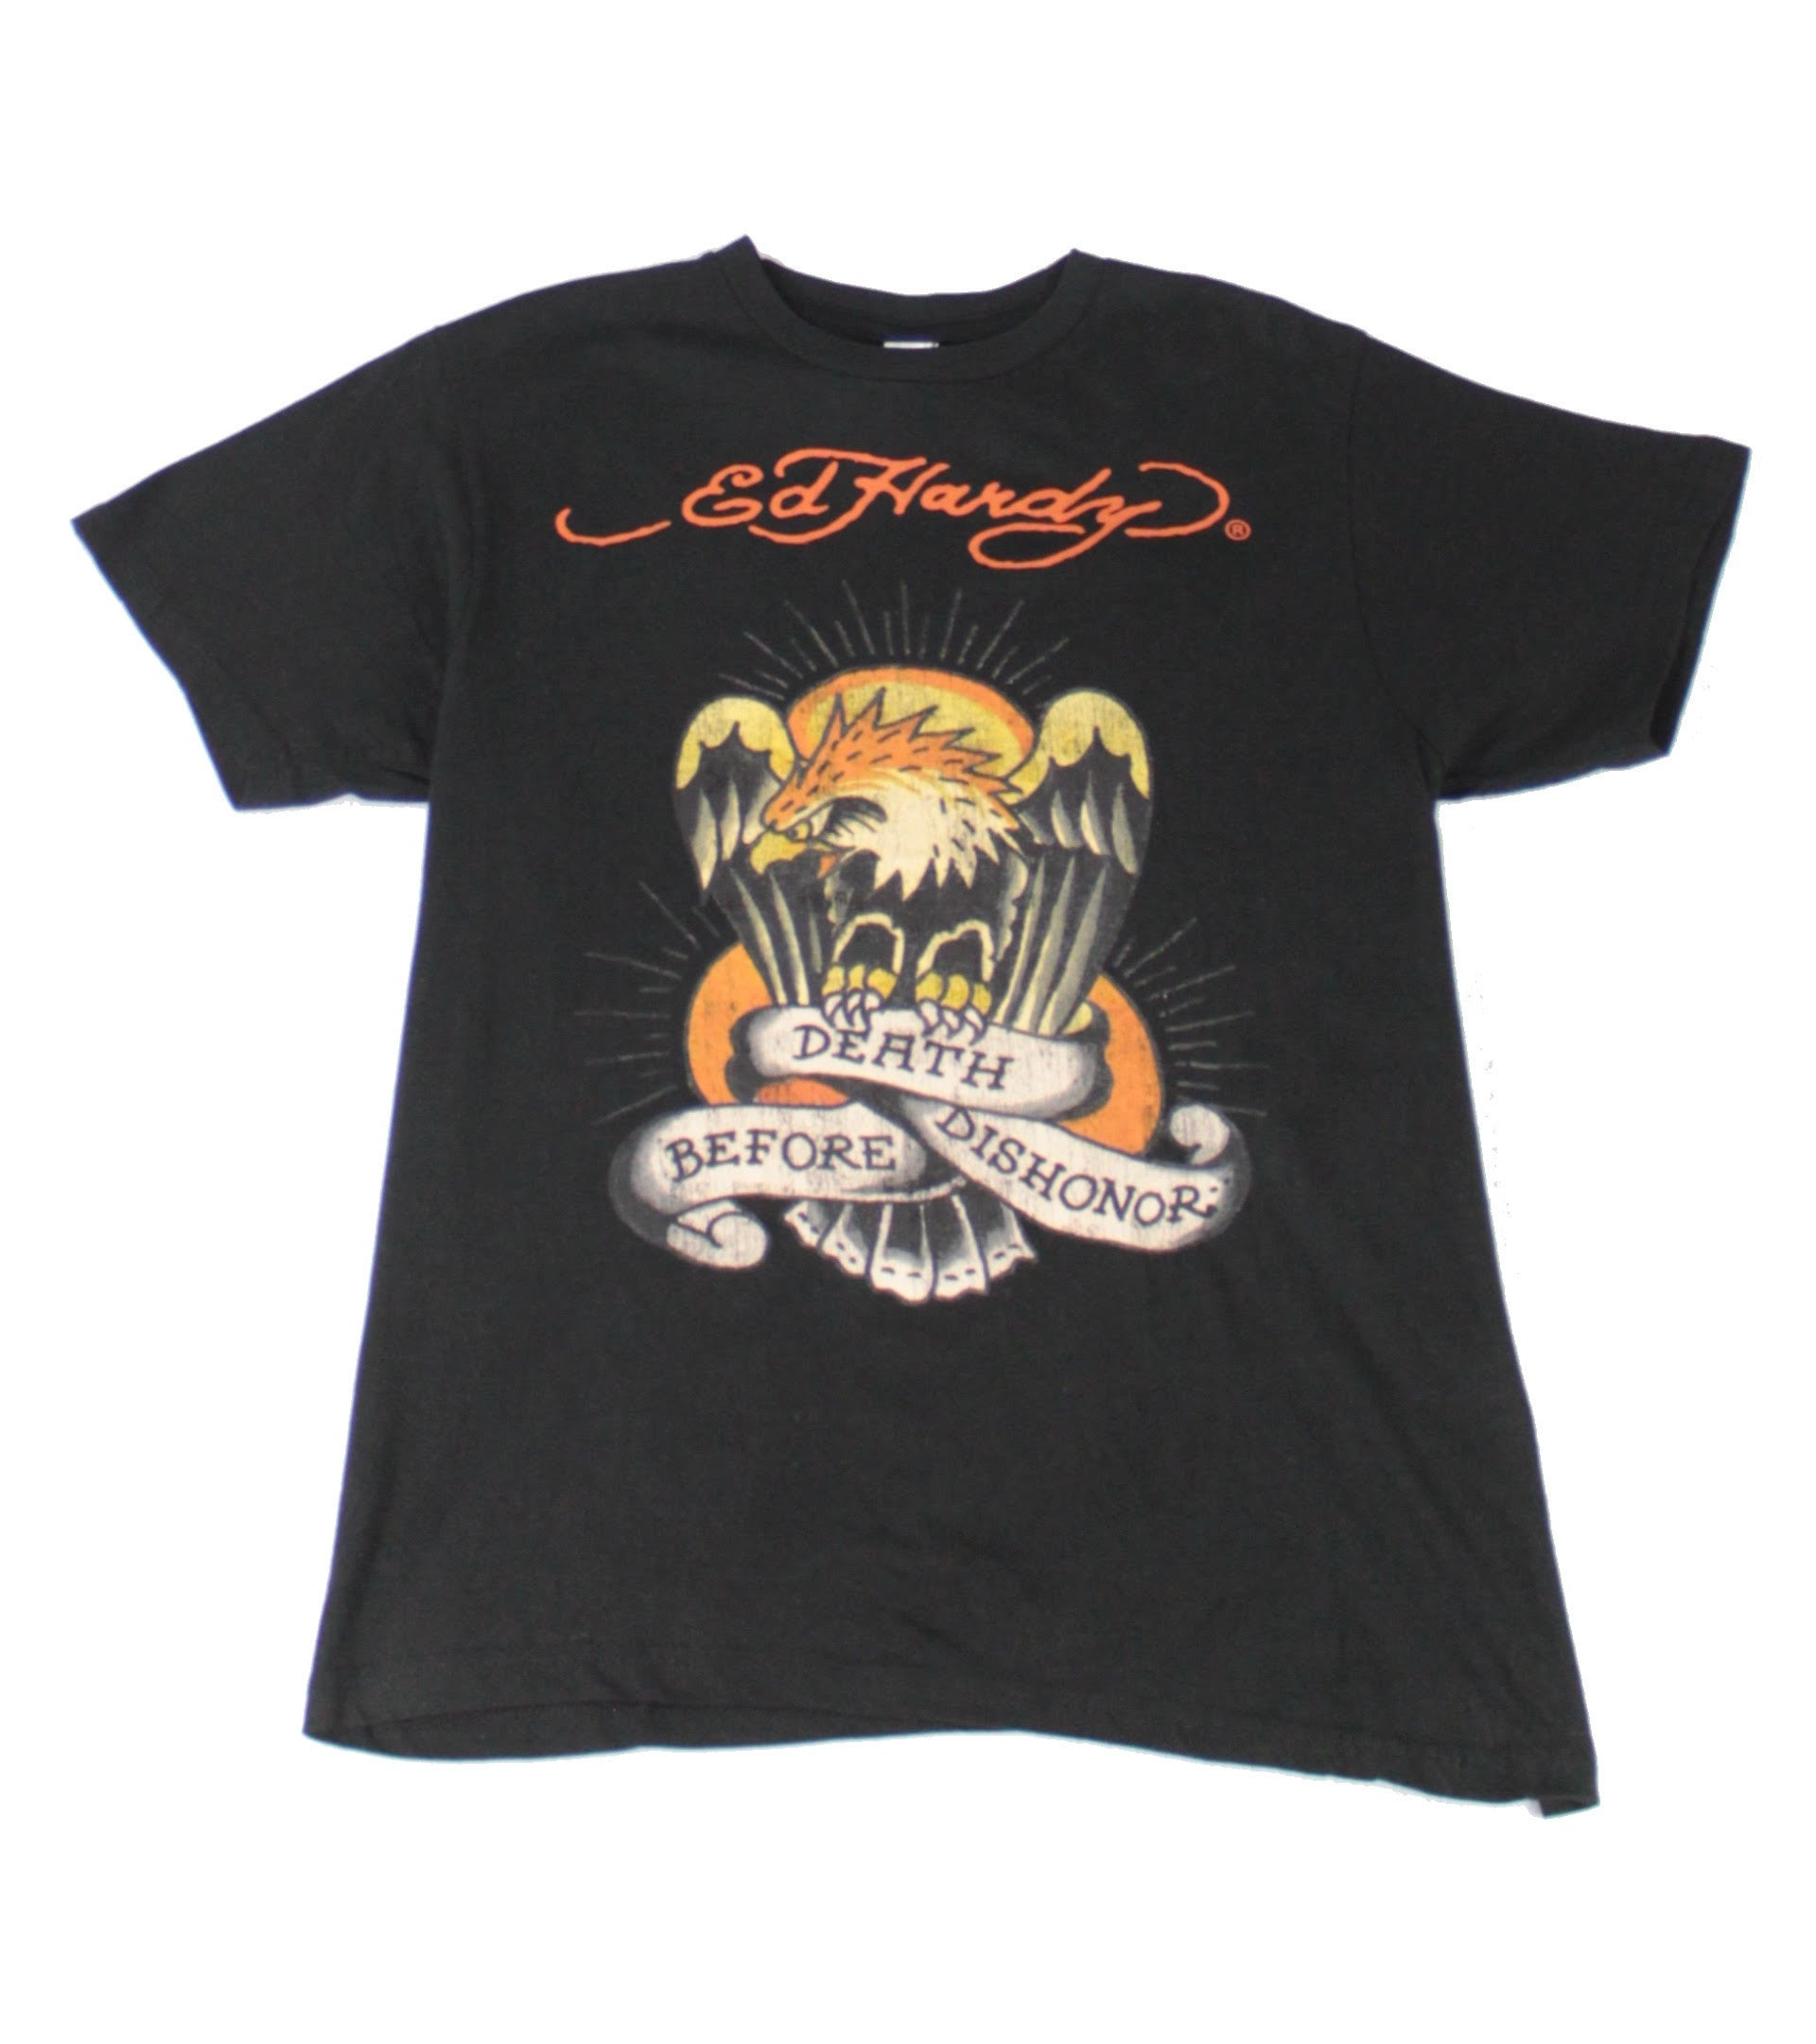 Ed Hardy Mens T-Shirt Black Size Medium M Death Before Dishonor Tee